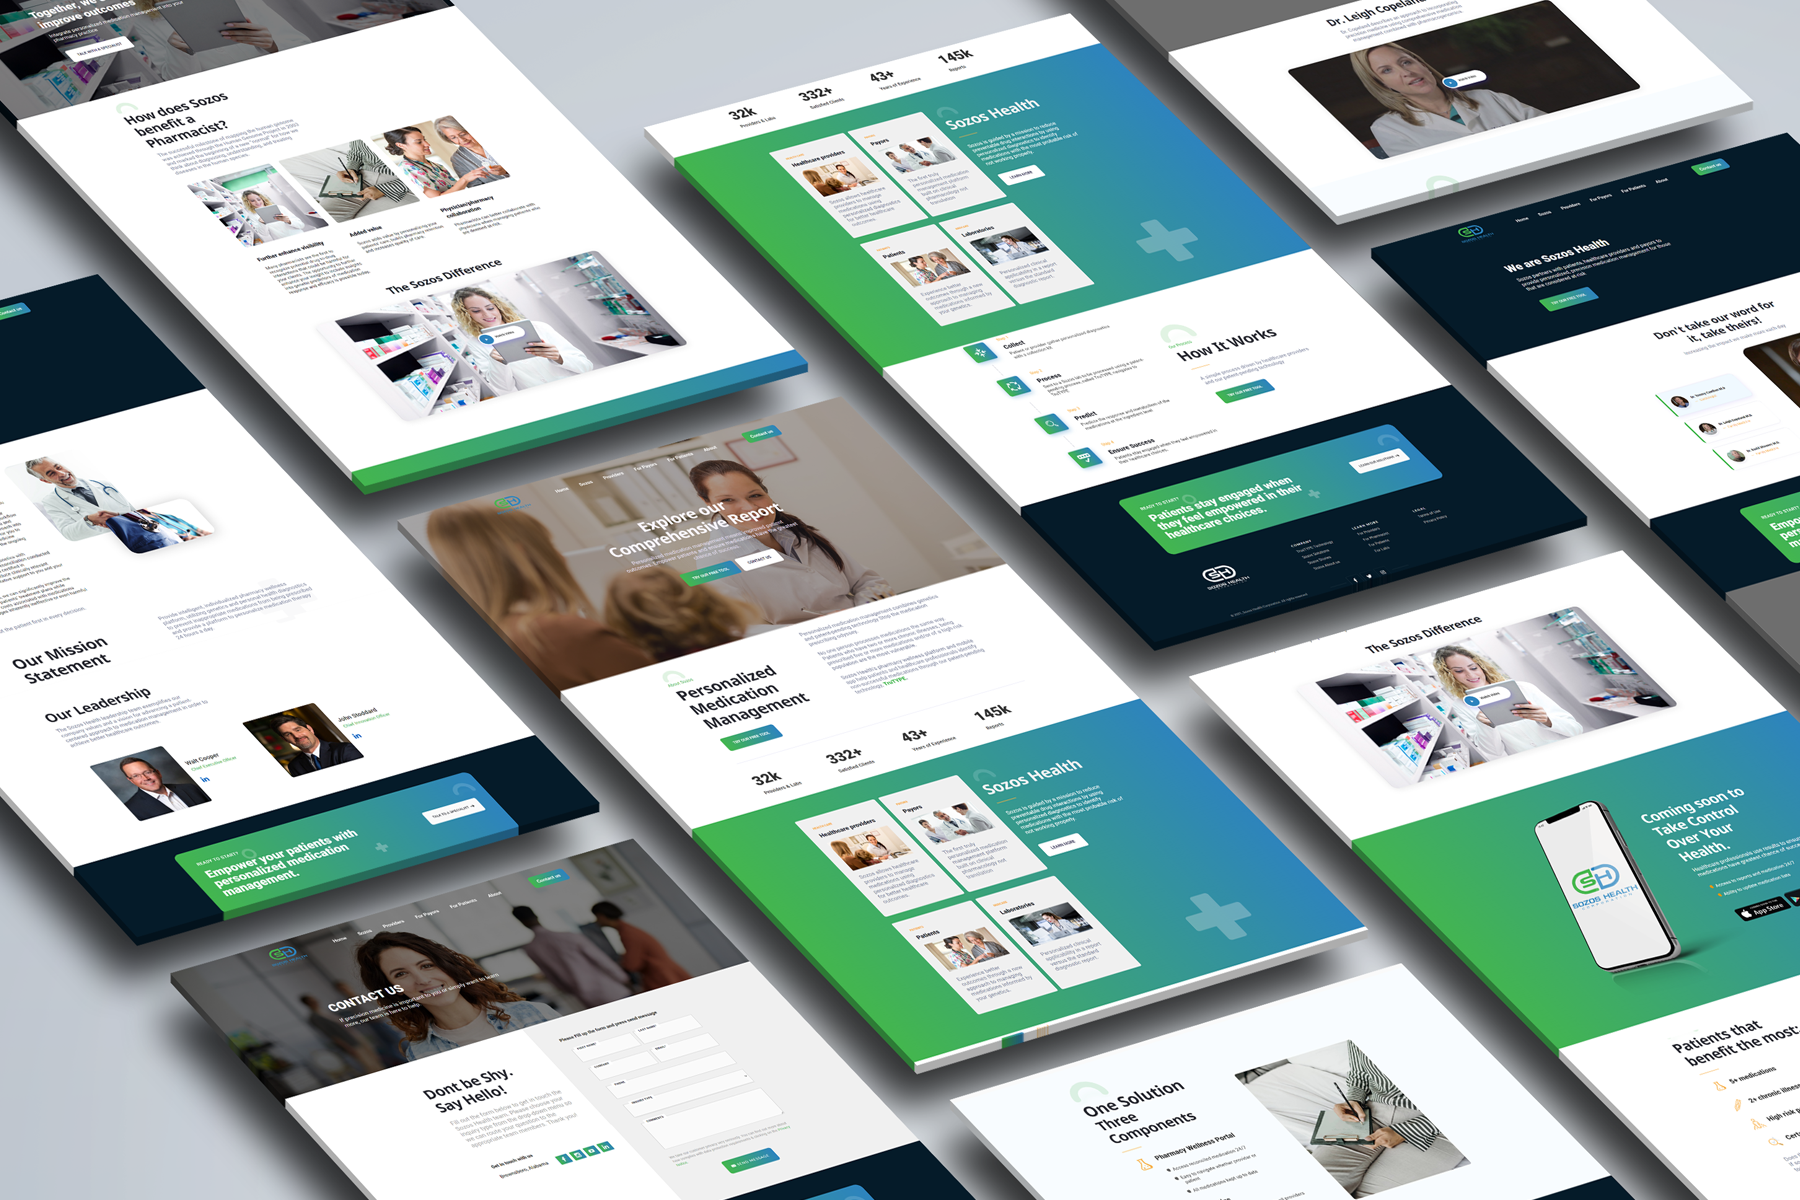 Sozos webflow design